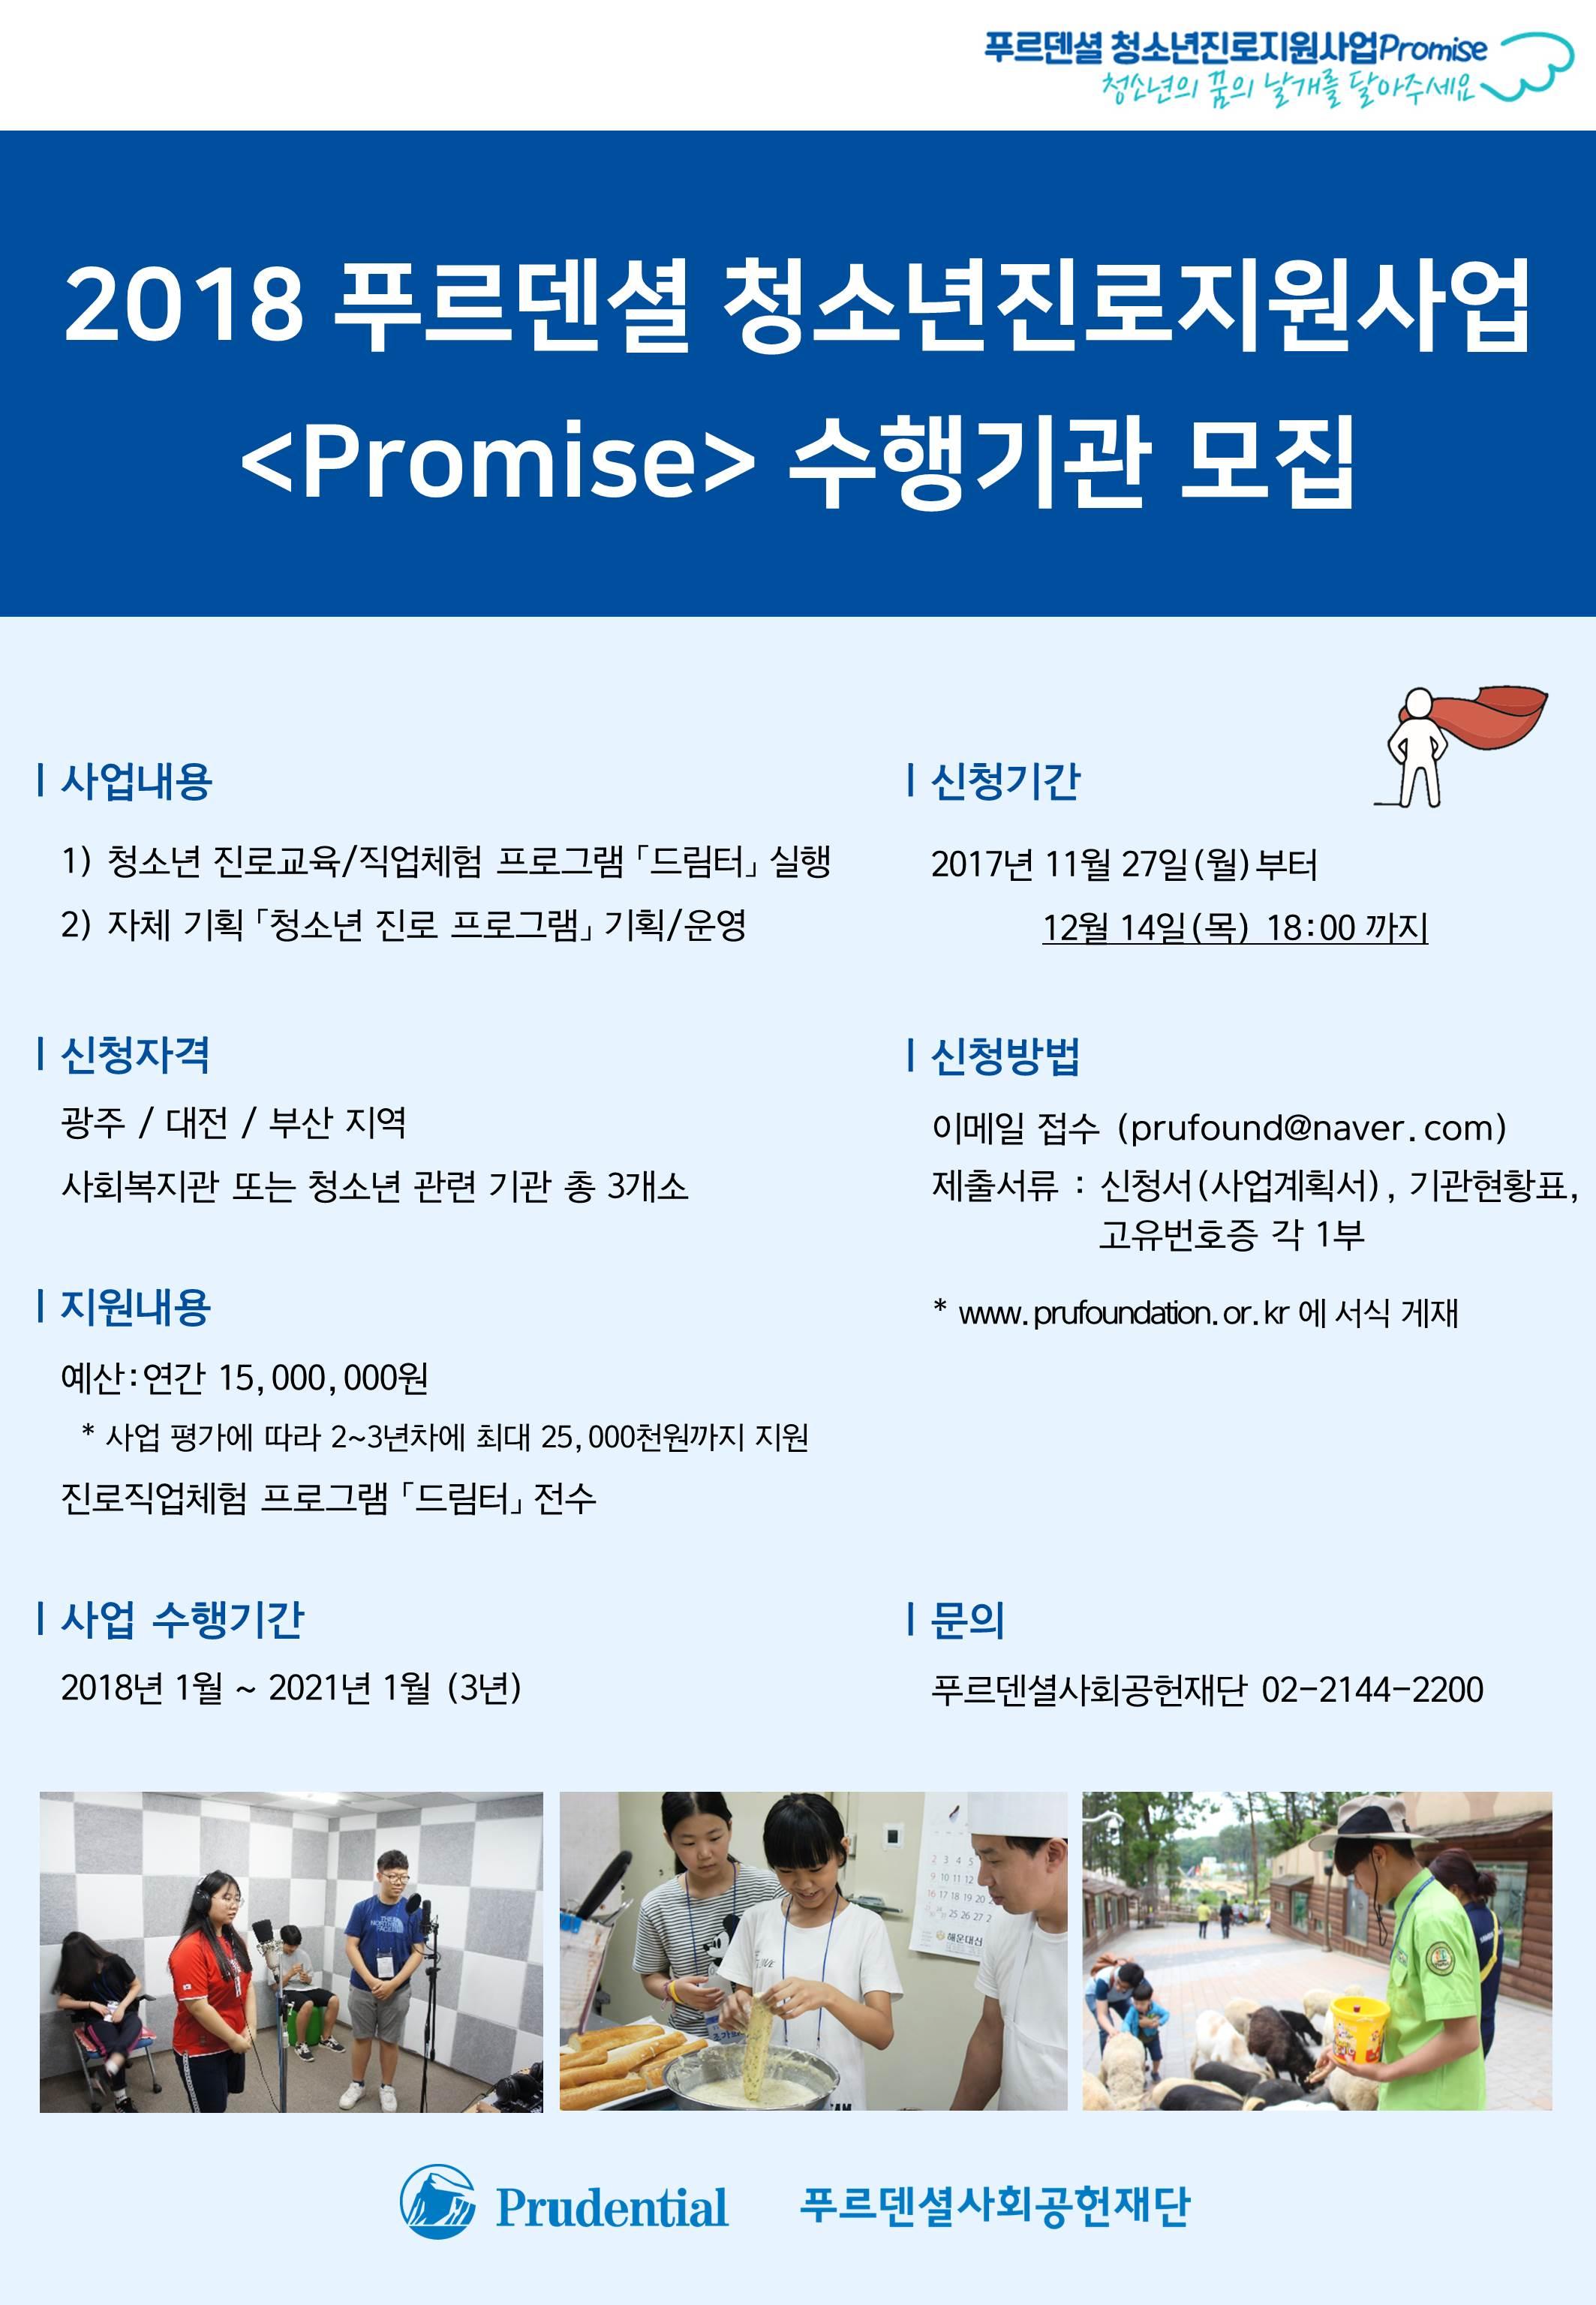 2018 Promise 공모사업 안내 포스터.jpg